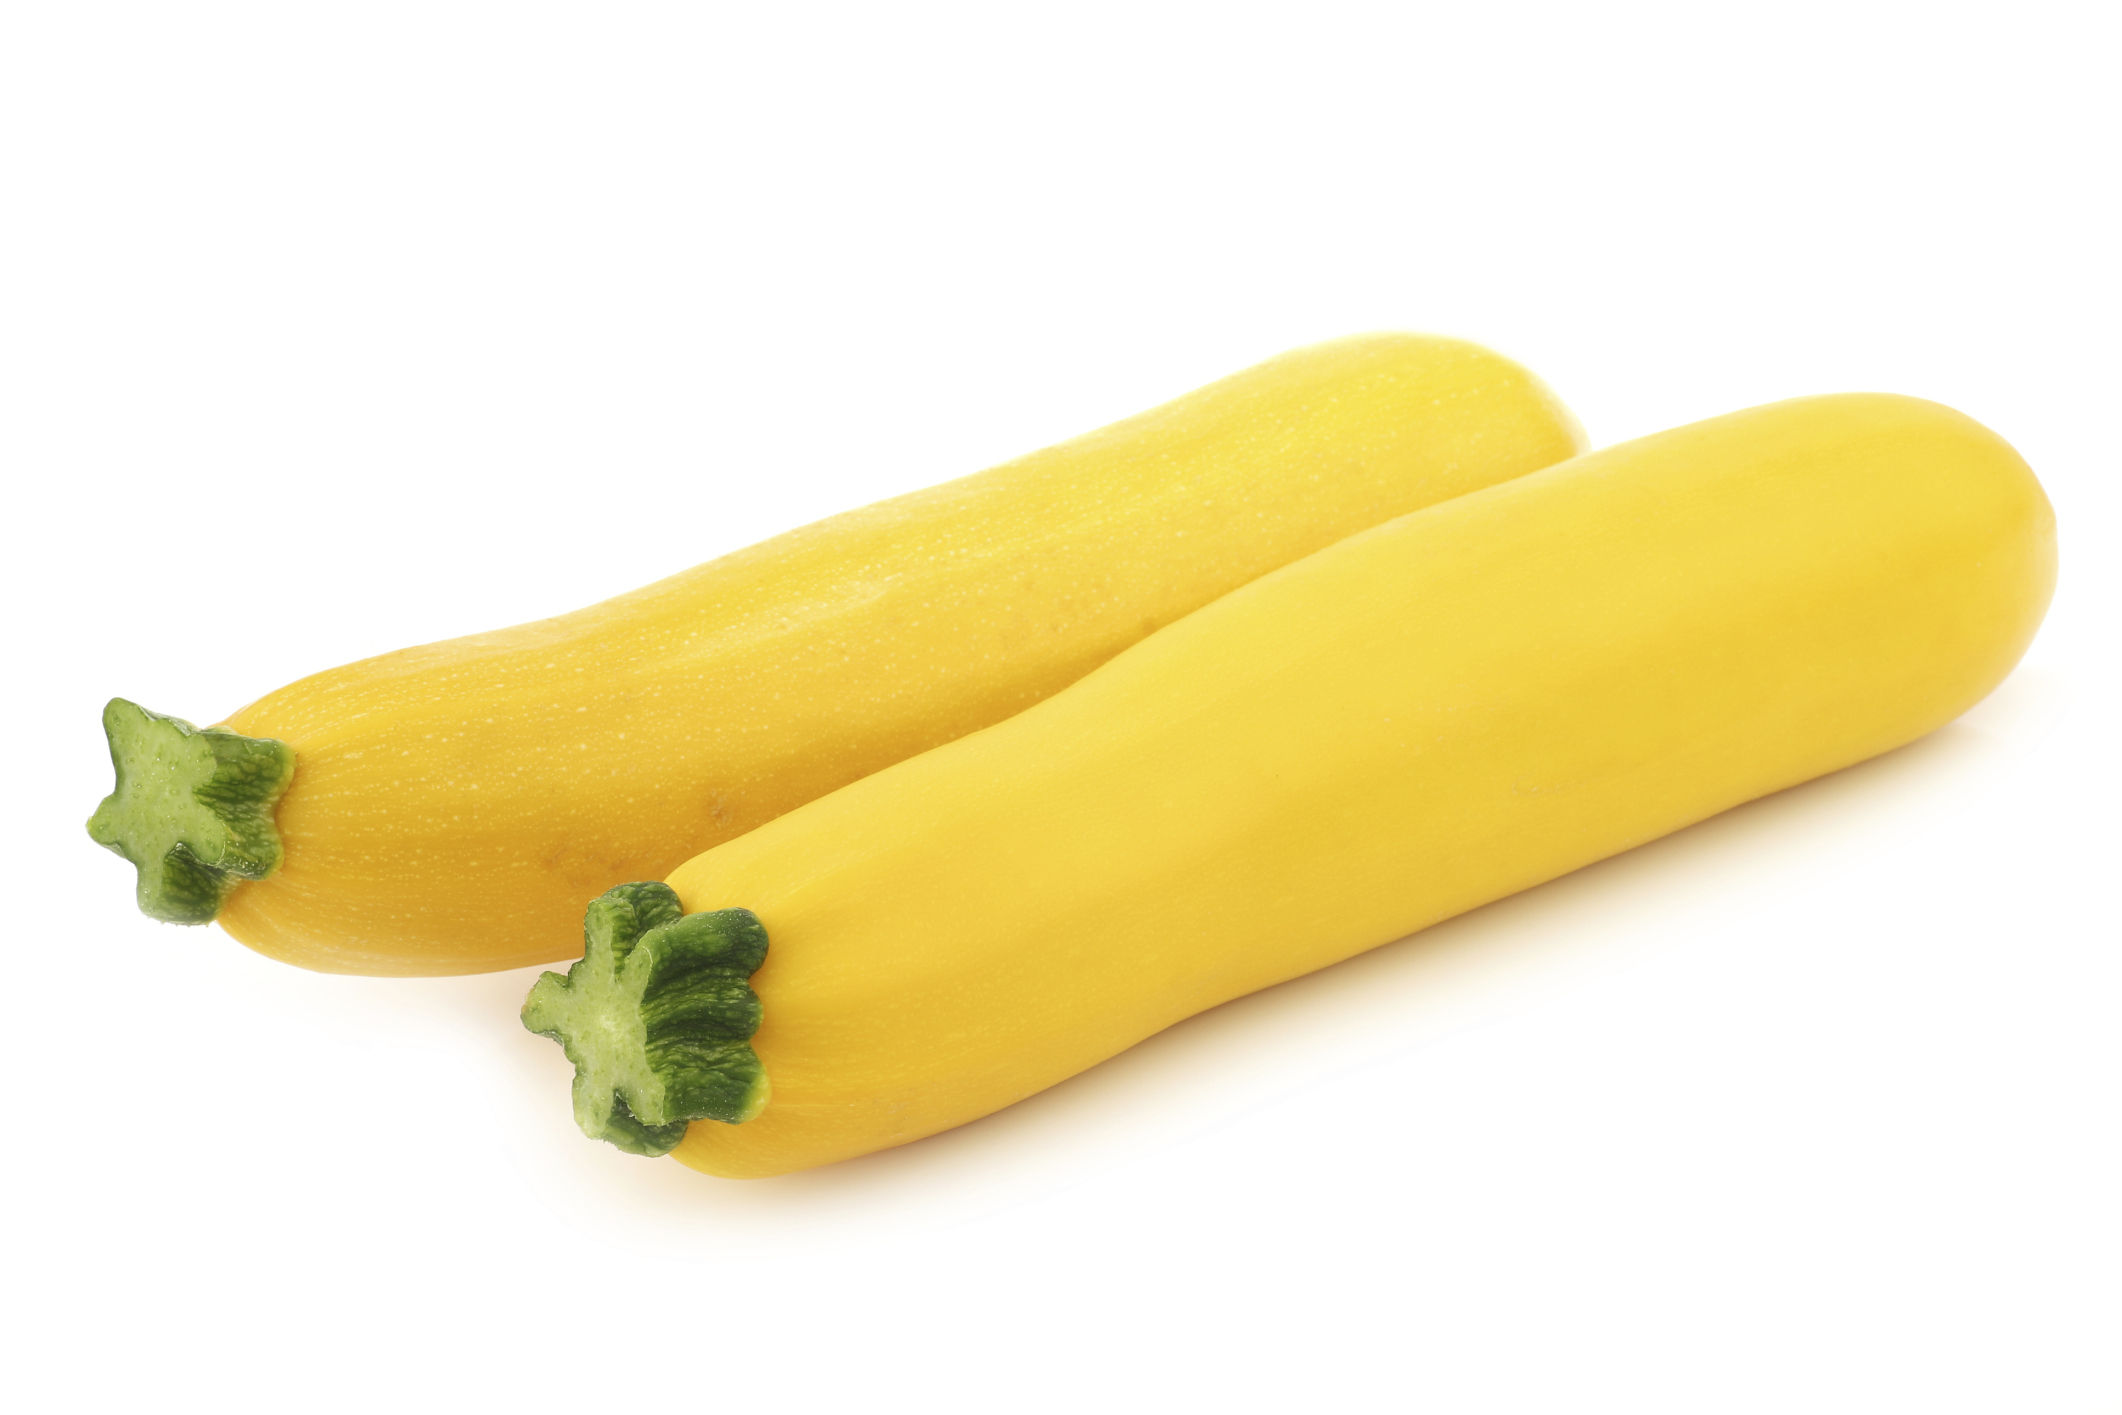 yellow zucchini montalbano farms. Black Bedroom Furniture Sets. Home Design Ideas